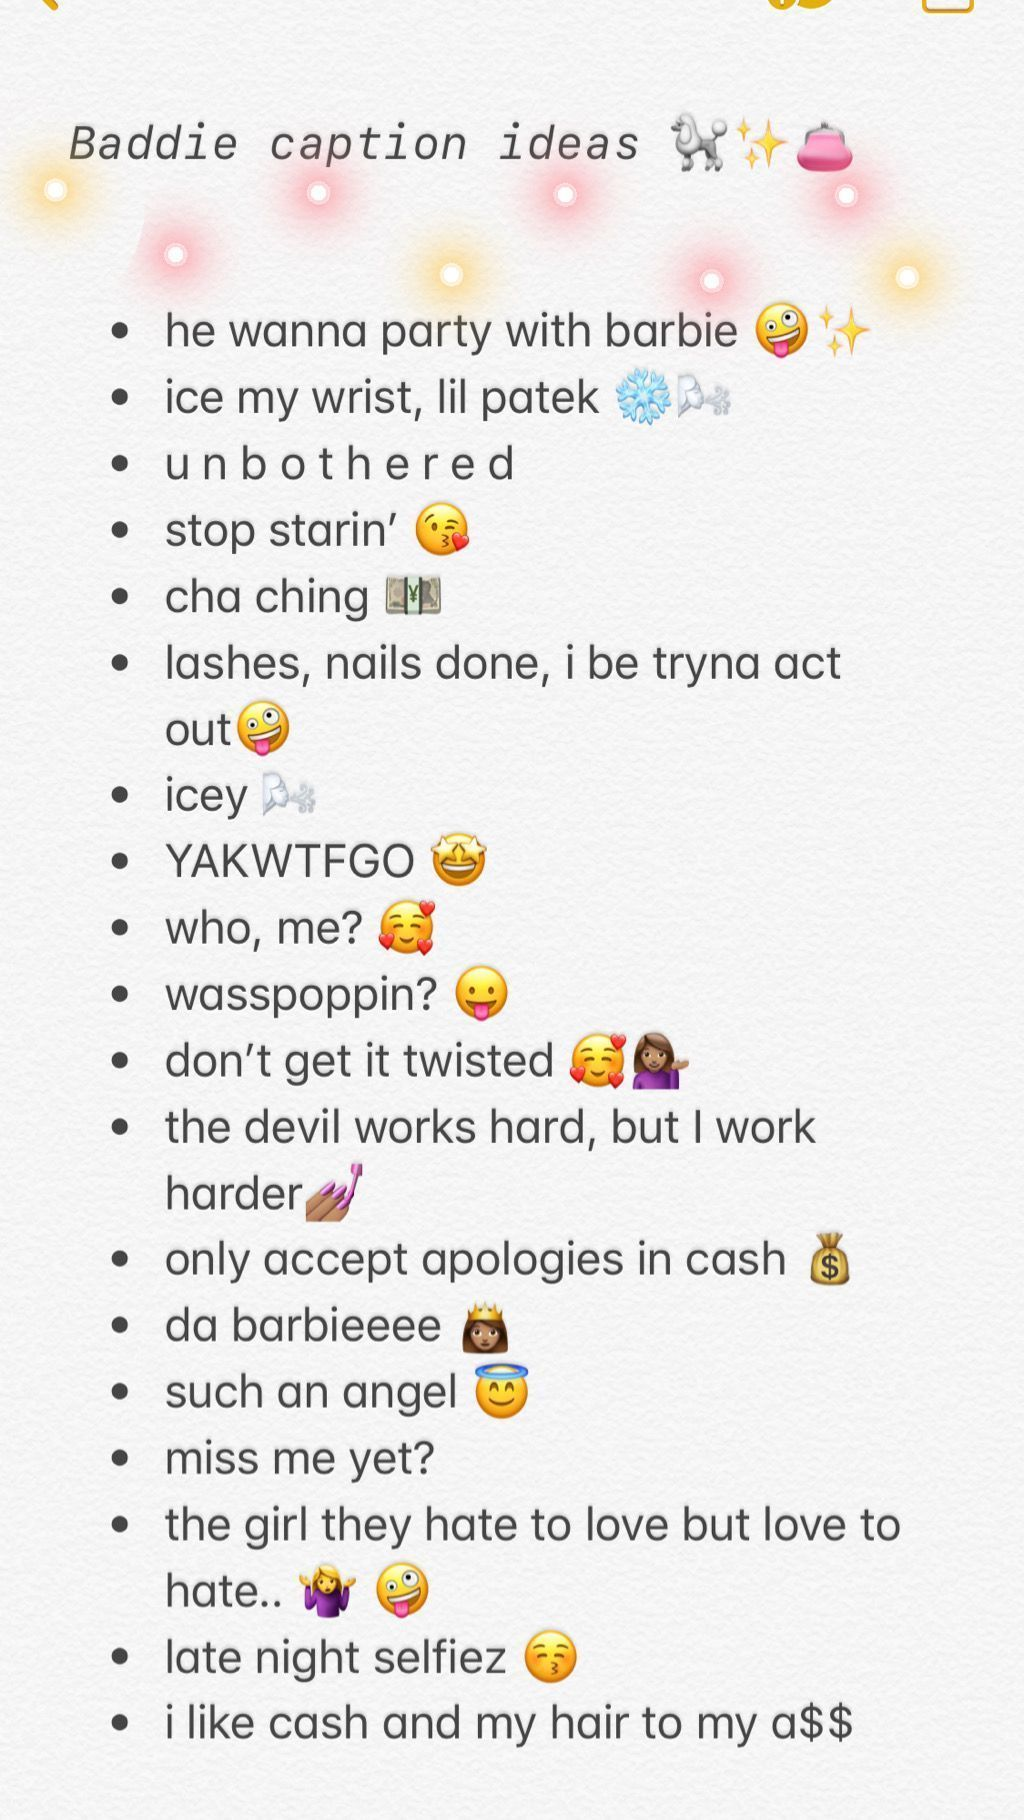 Funny Good Cool Instagram Username Ideas New Whitedust Kata Kata Indah Kata Kata Motivasi Kutipan Instagram Lucu